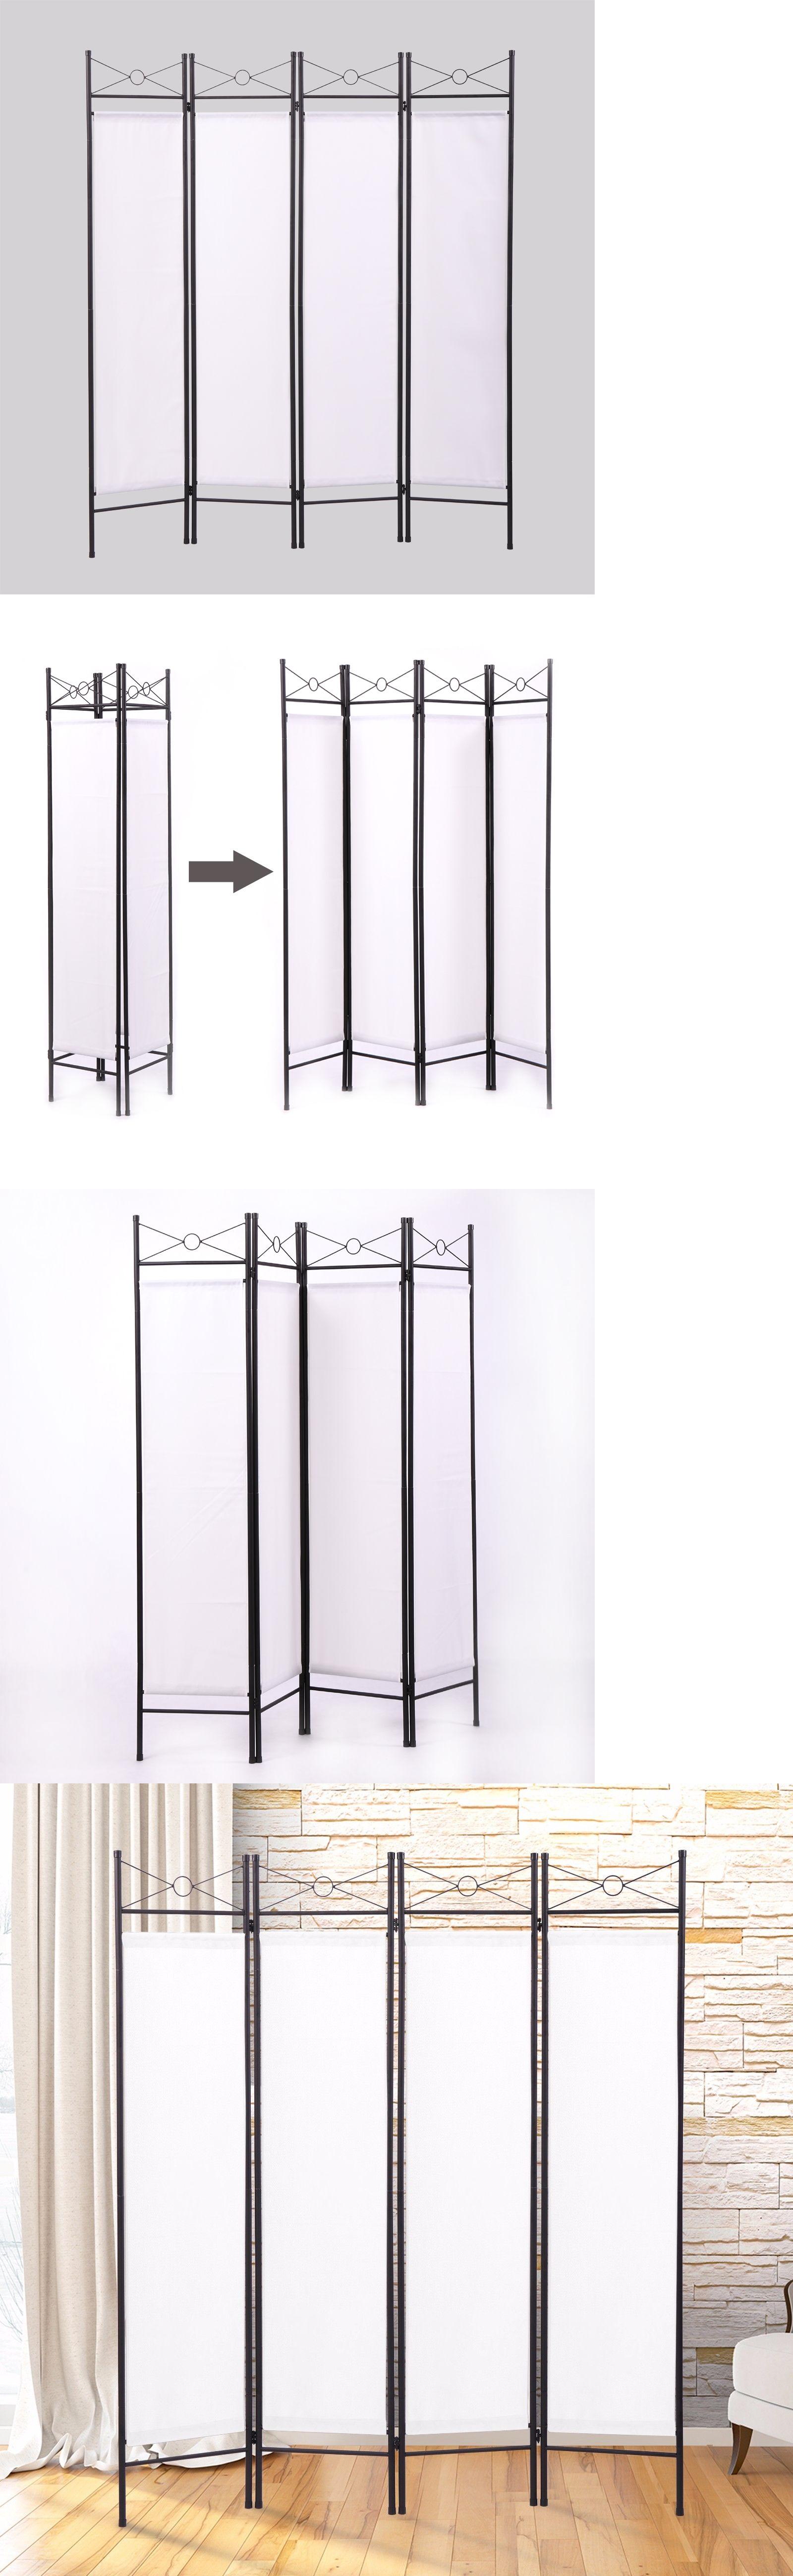 Metal Frame Room Divider Panel Screen Amazoncom JAXPETY 4 Panel Room ...